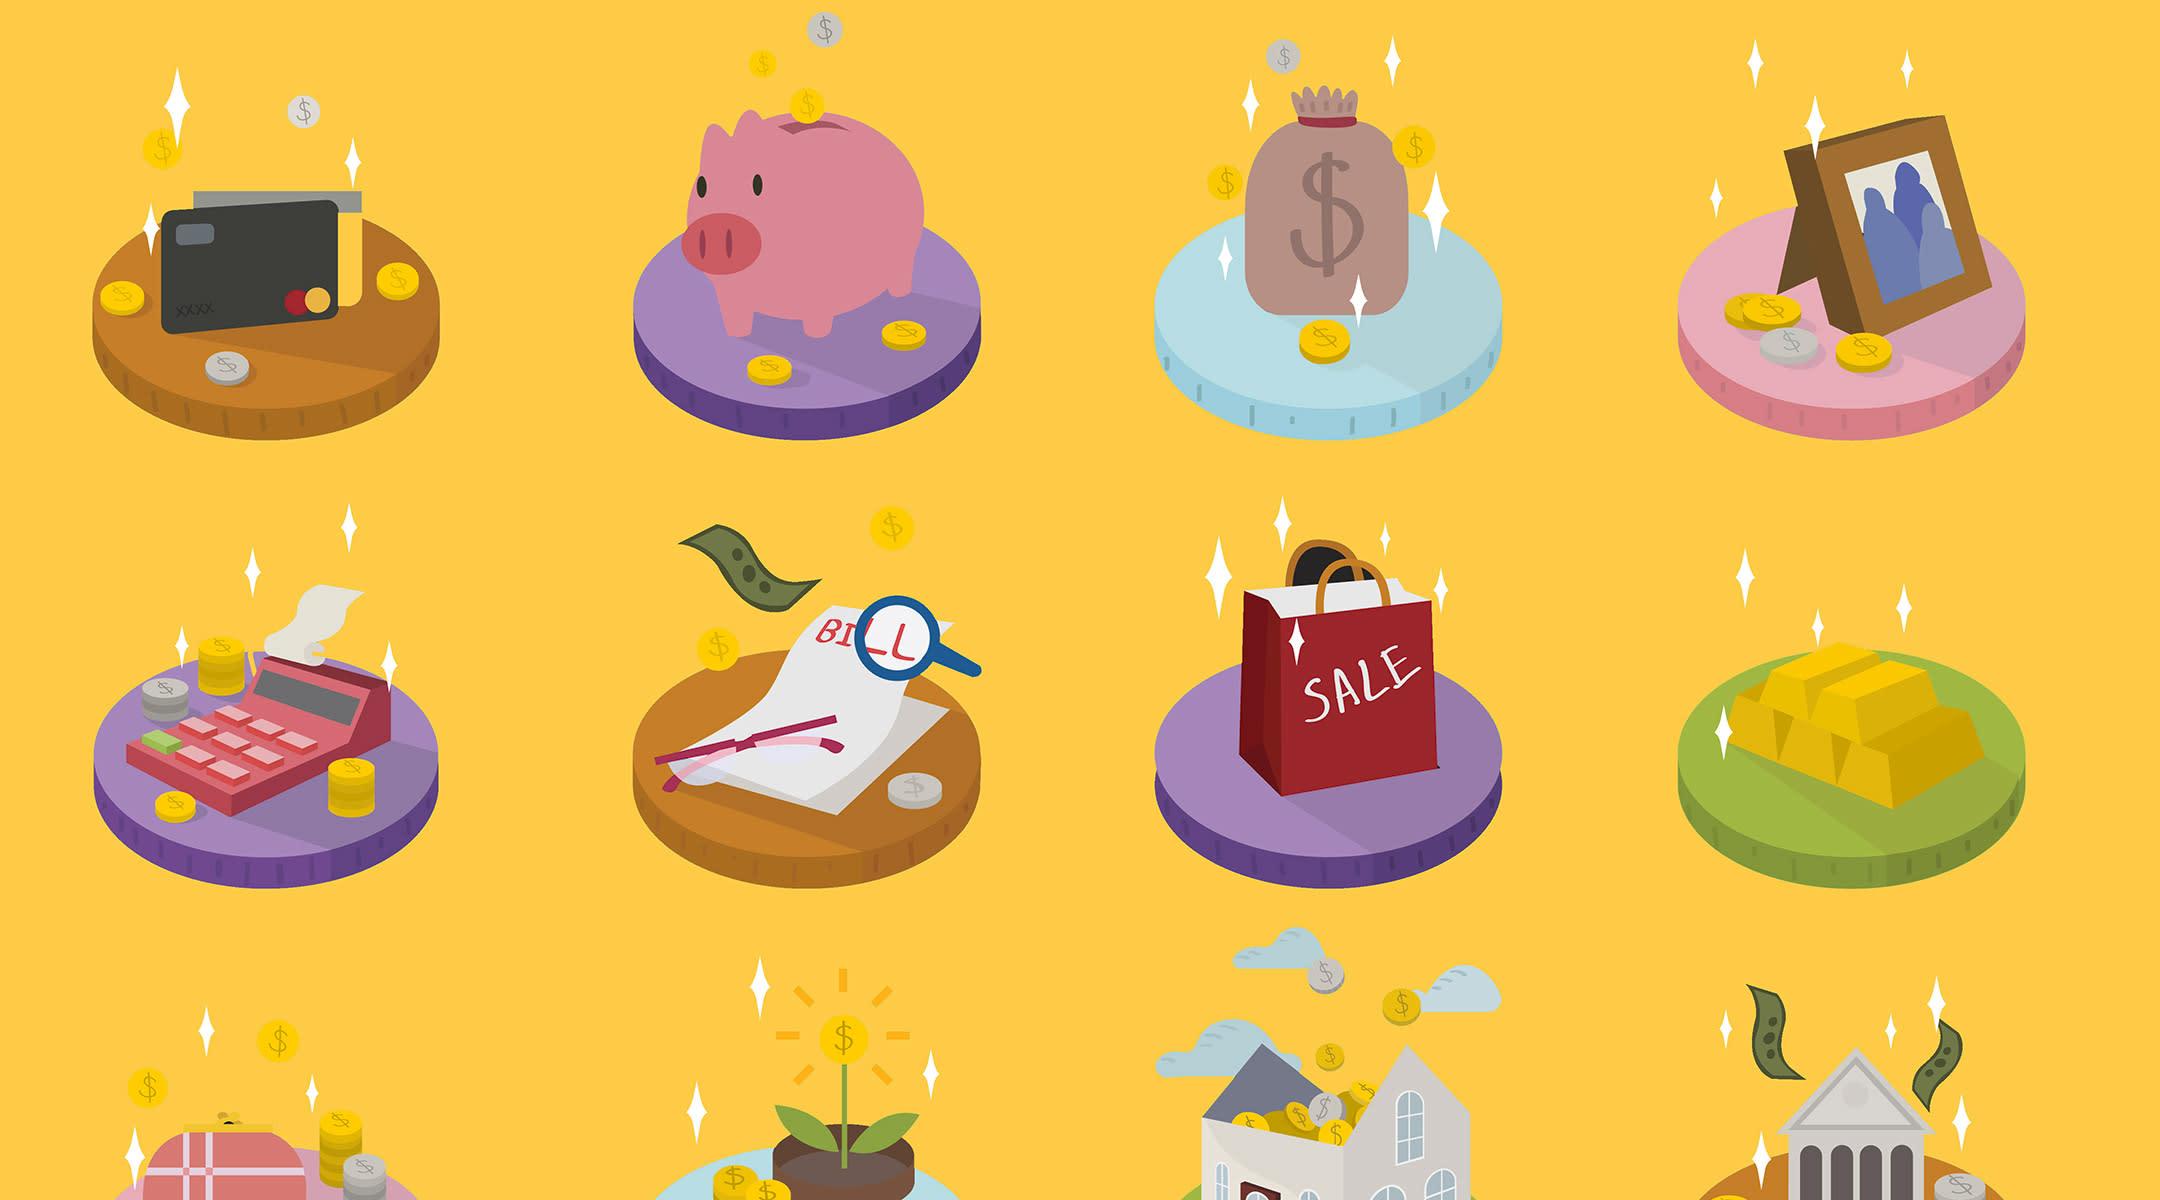 spot illustrations relating to money